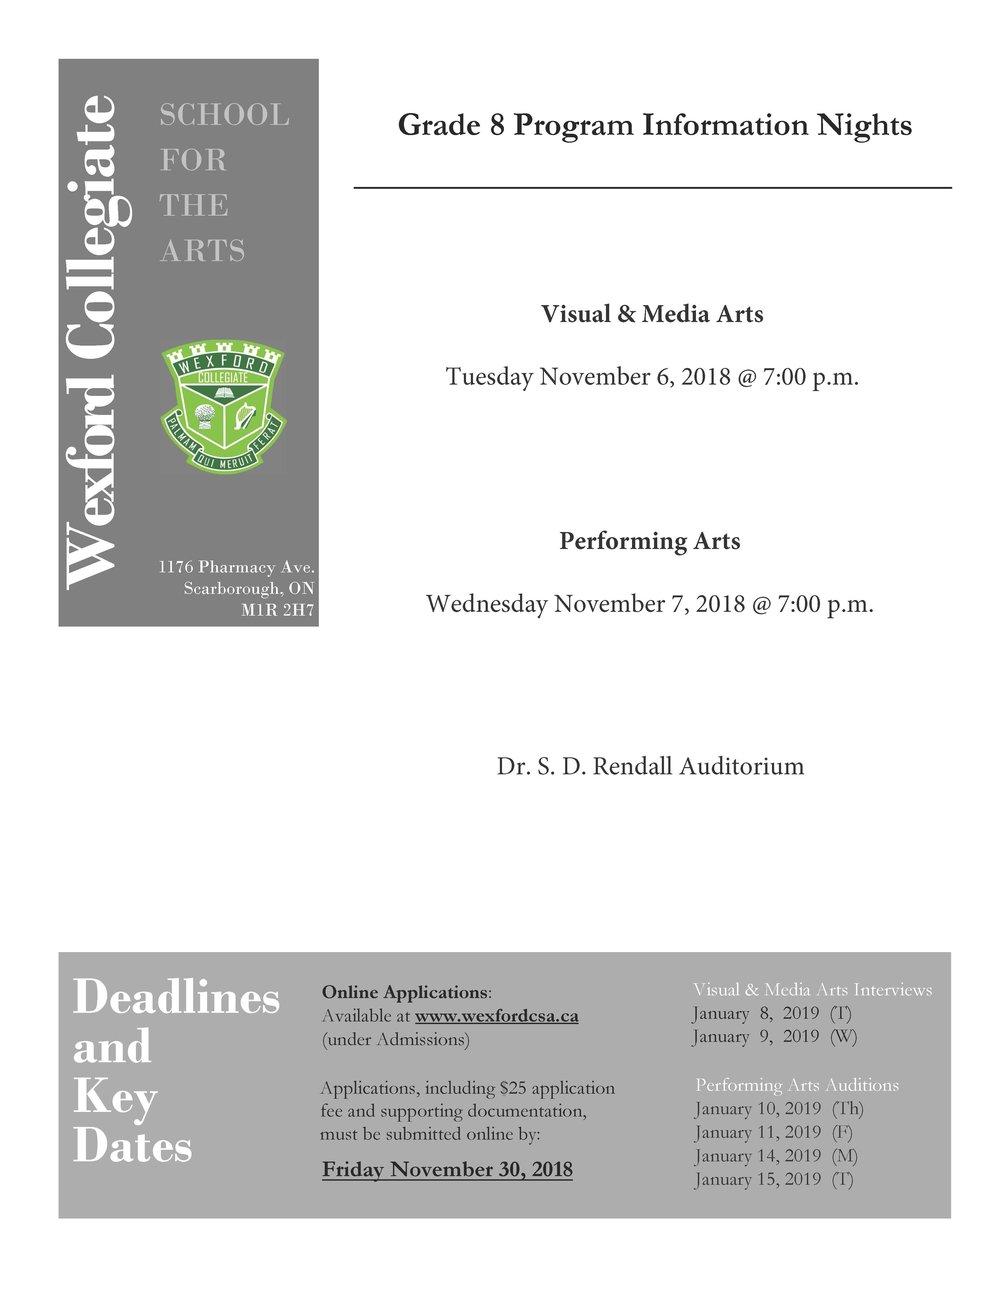 Grade 8 Program Info Night 2018 Flyer VMA and PA Final.jpg